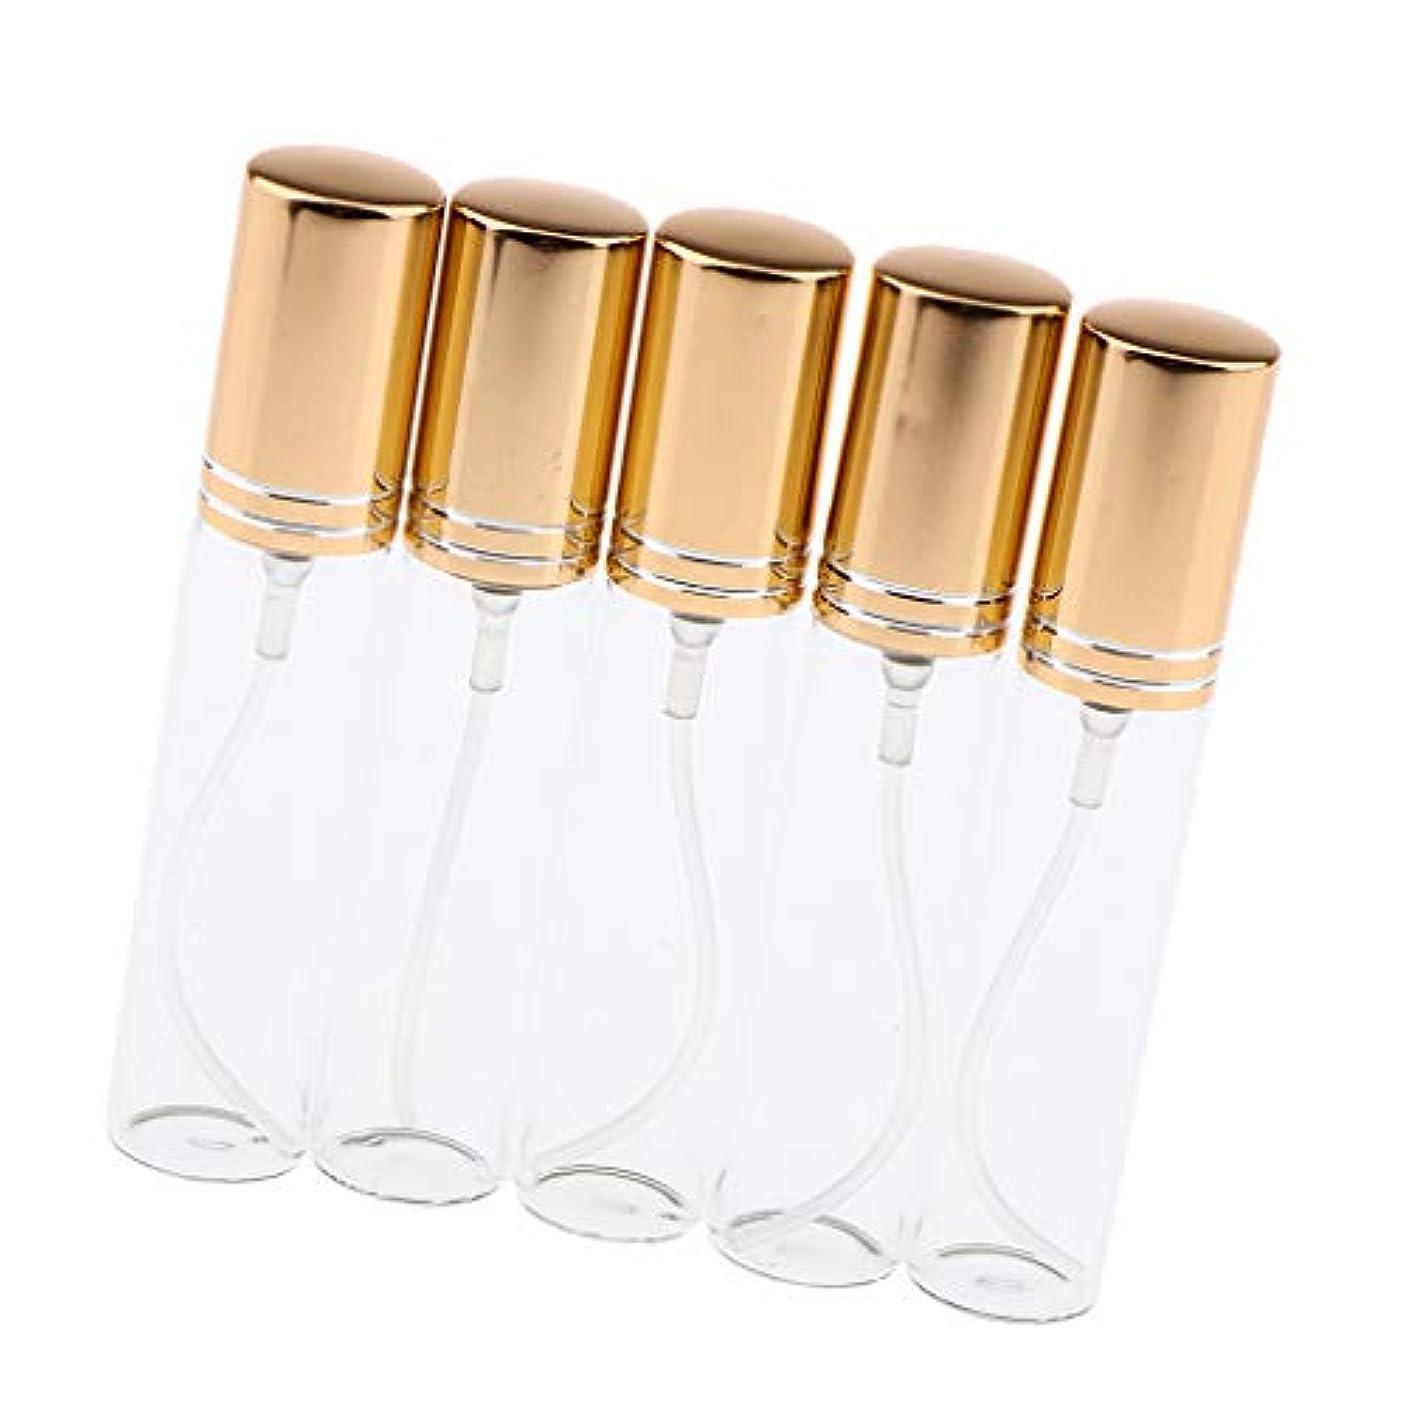 Perfeclan 5個セット 詰替え容器 ガラスボトル サンプルボトル 10ミリリットル 香水スプレーボトル 全6色 - ゴールド